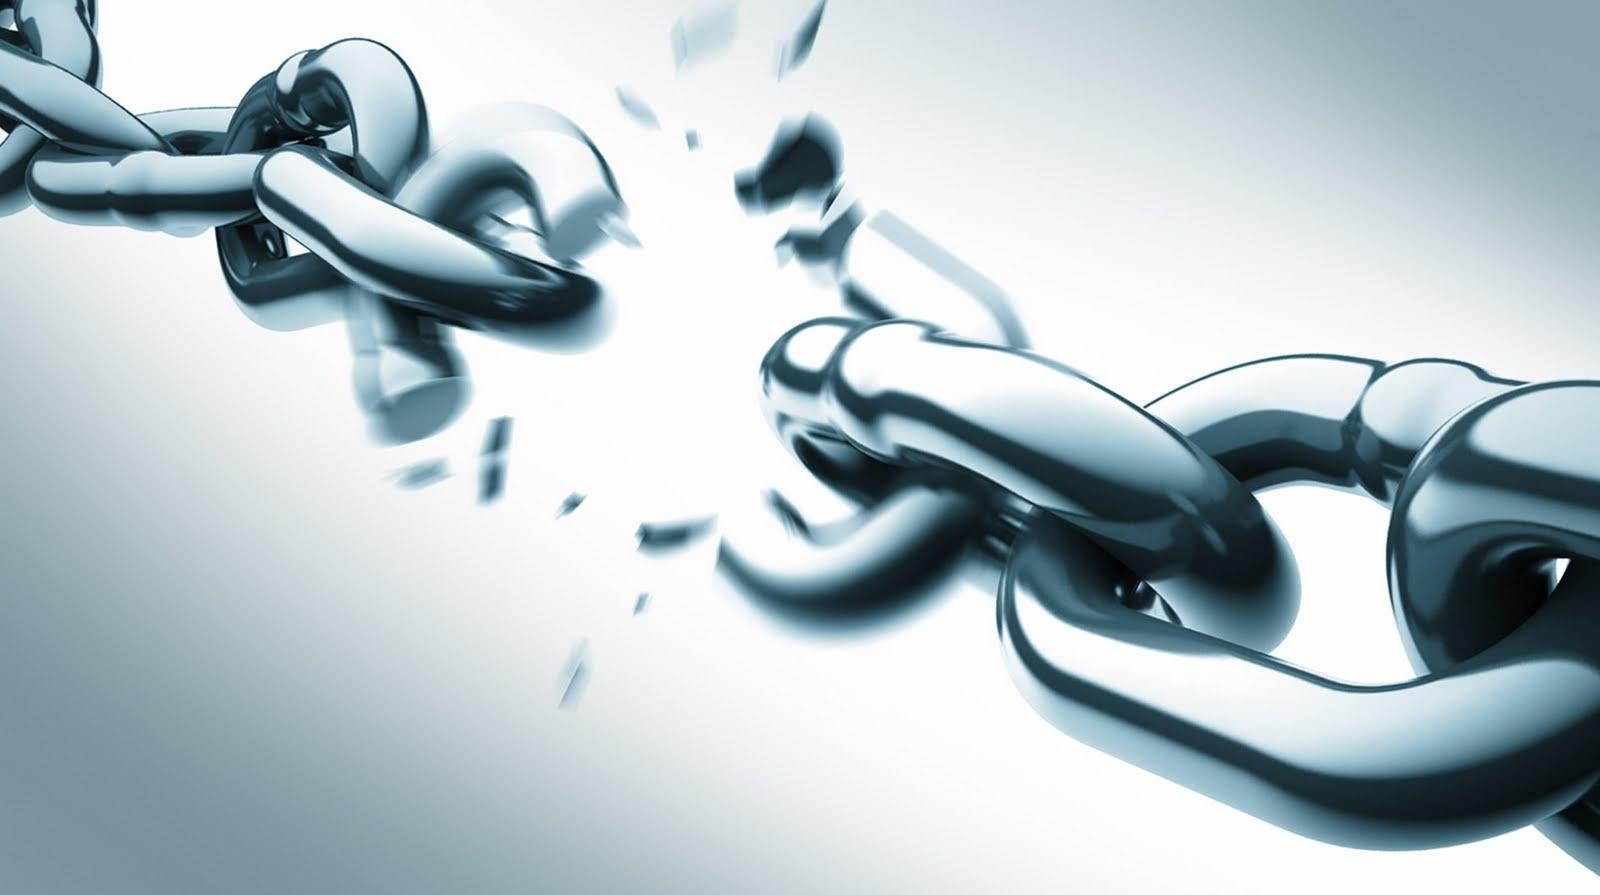 iglesia de cristo rompe cadenas: